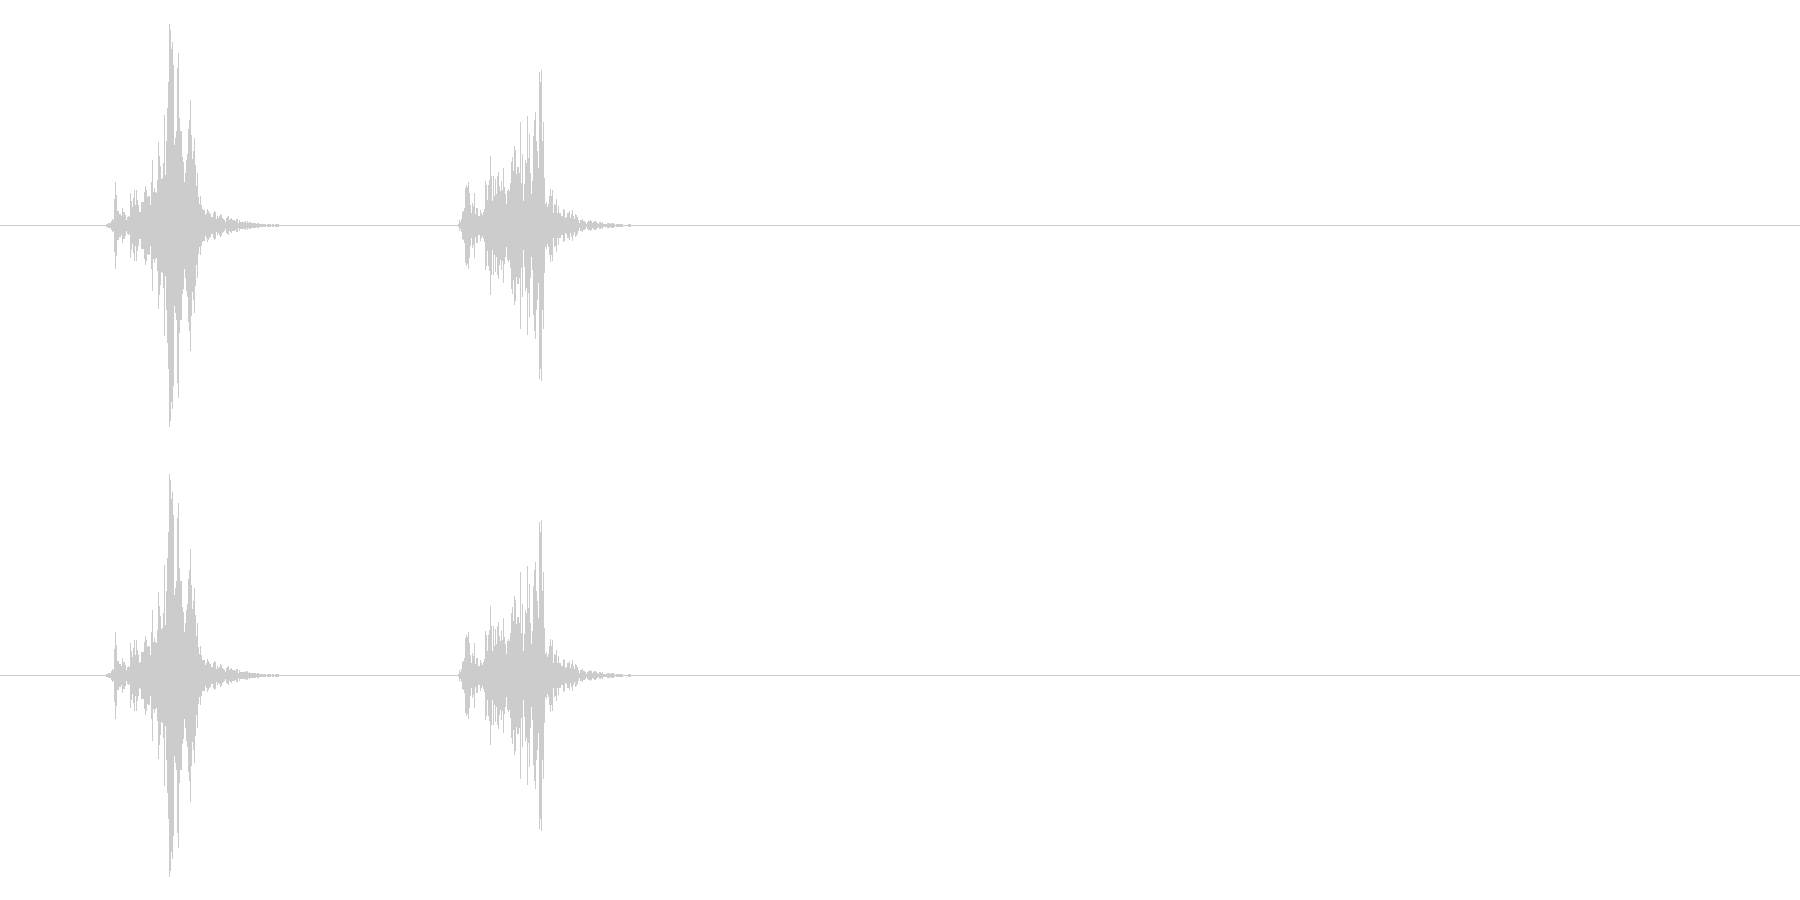 PC マウス03-18(スクロール 速)の未再生の波形